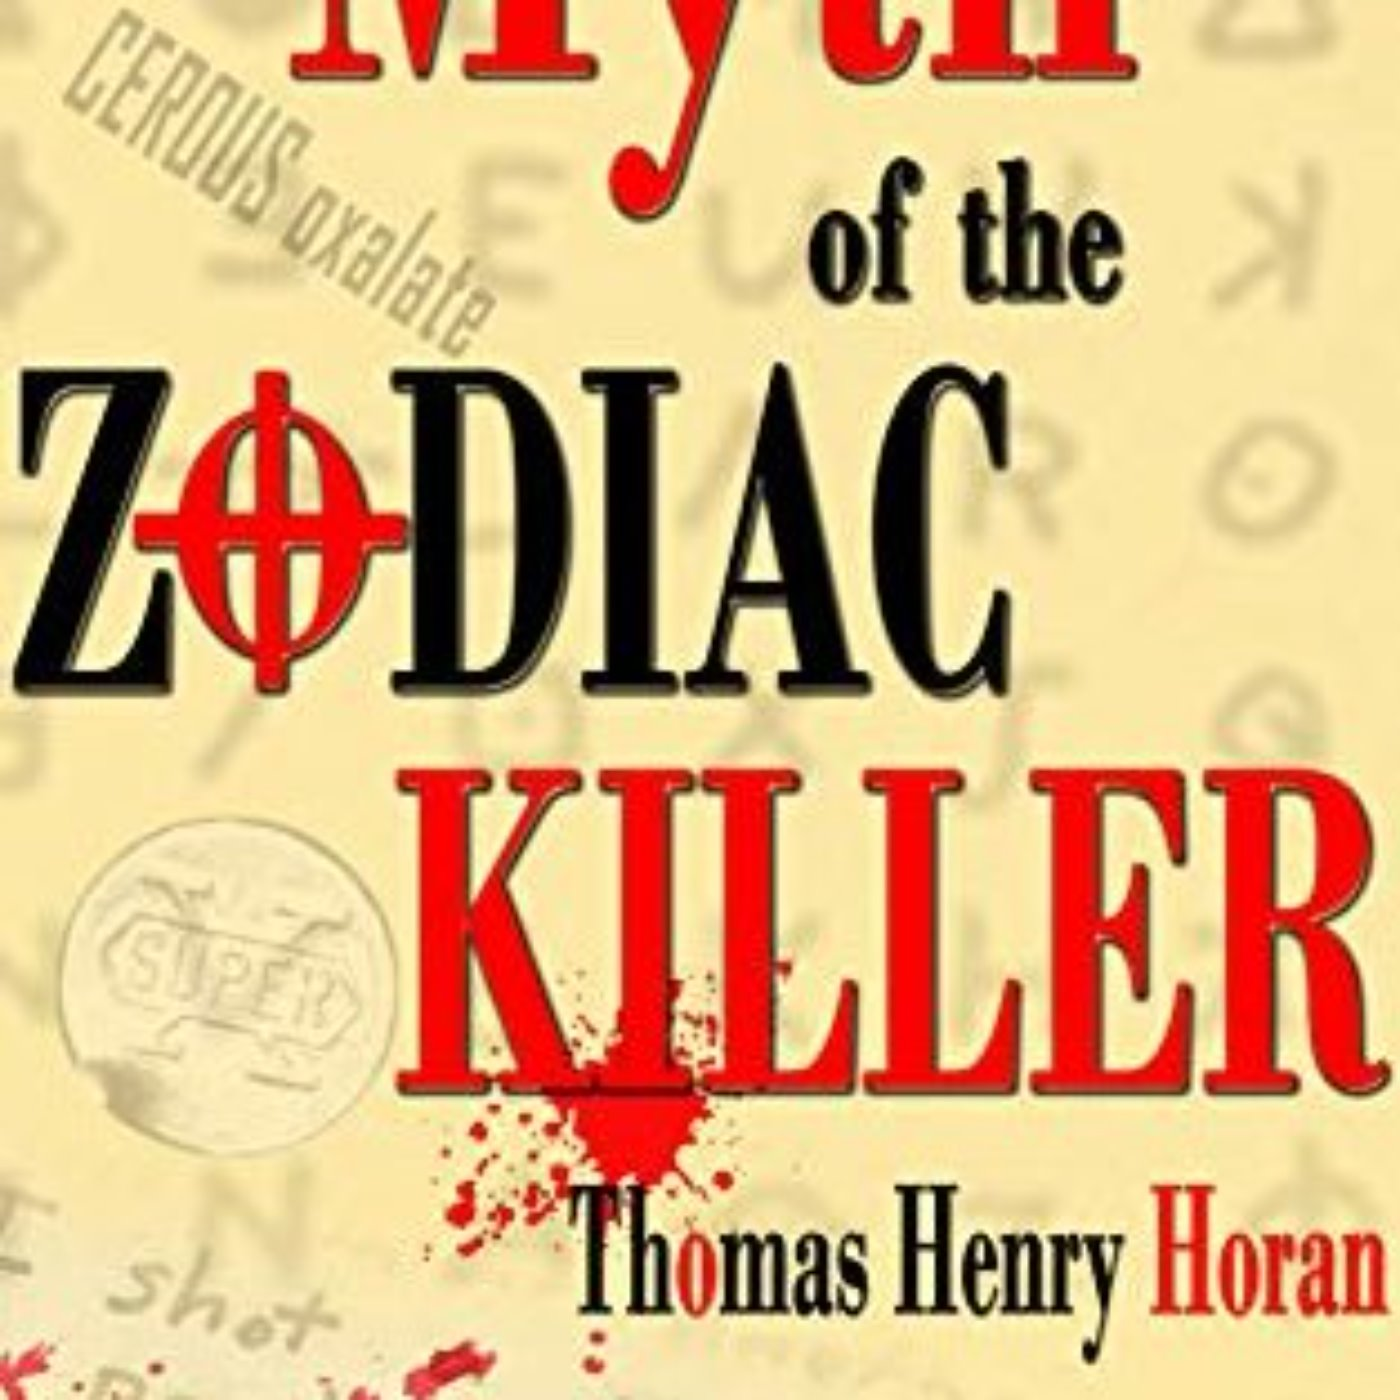 ZODIAC REVISITED - THOMAS HORAN 2015